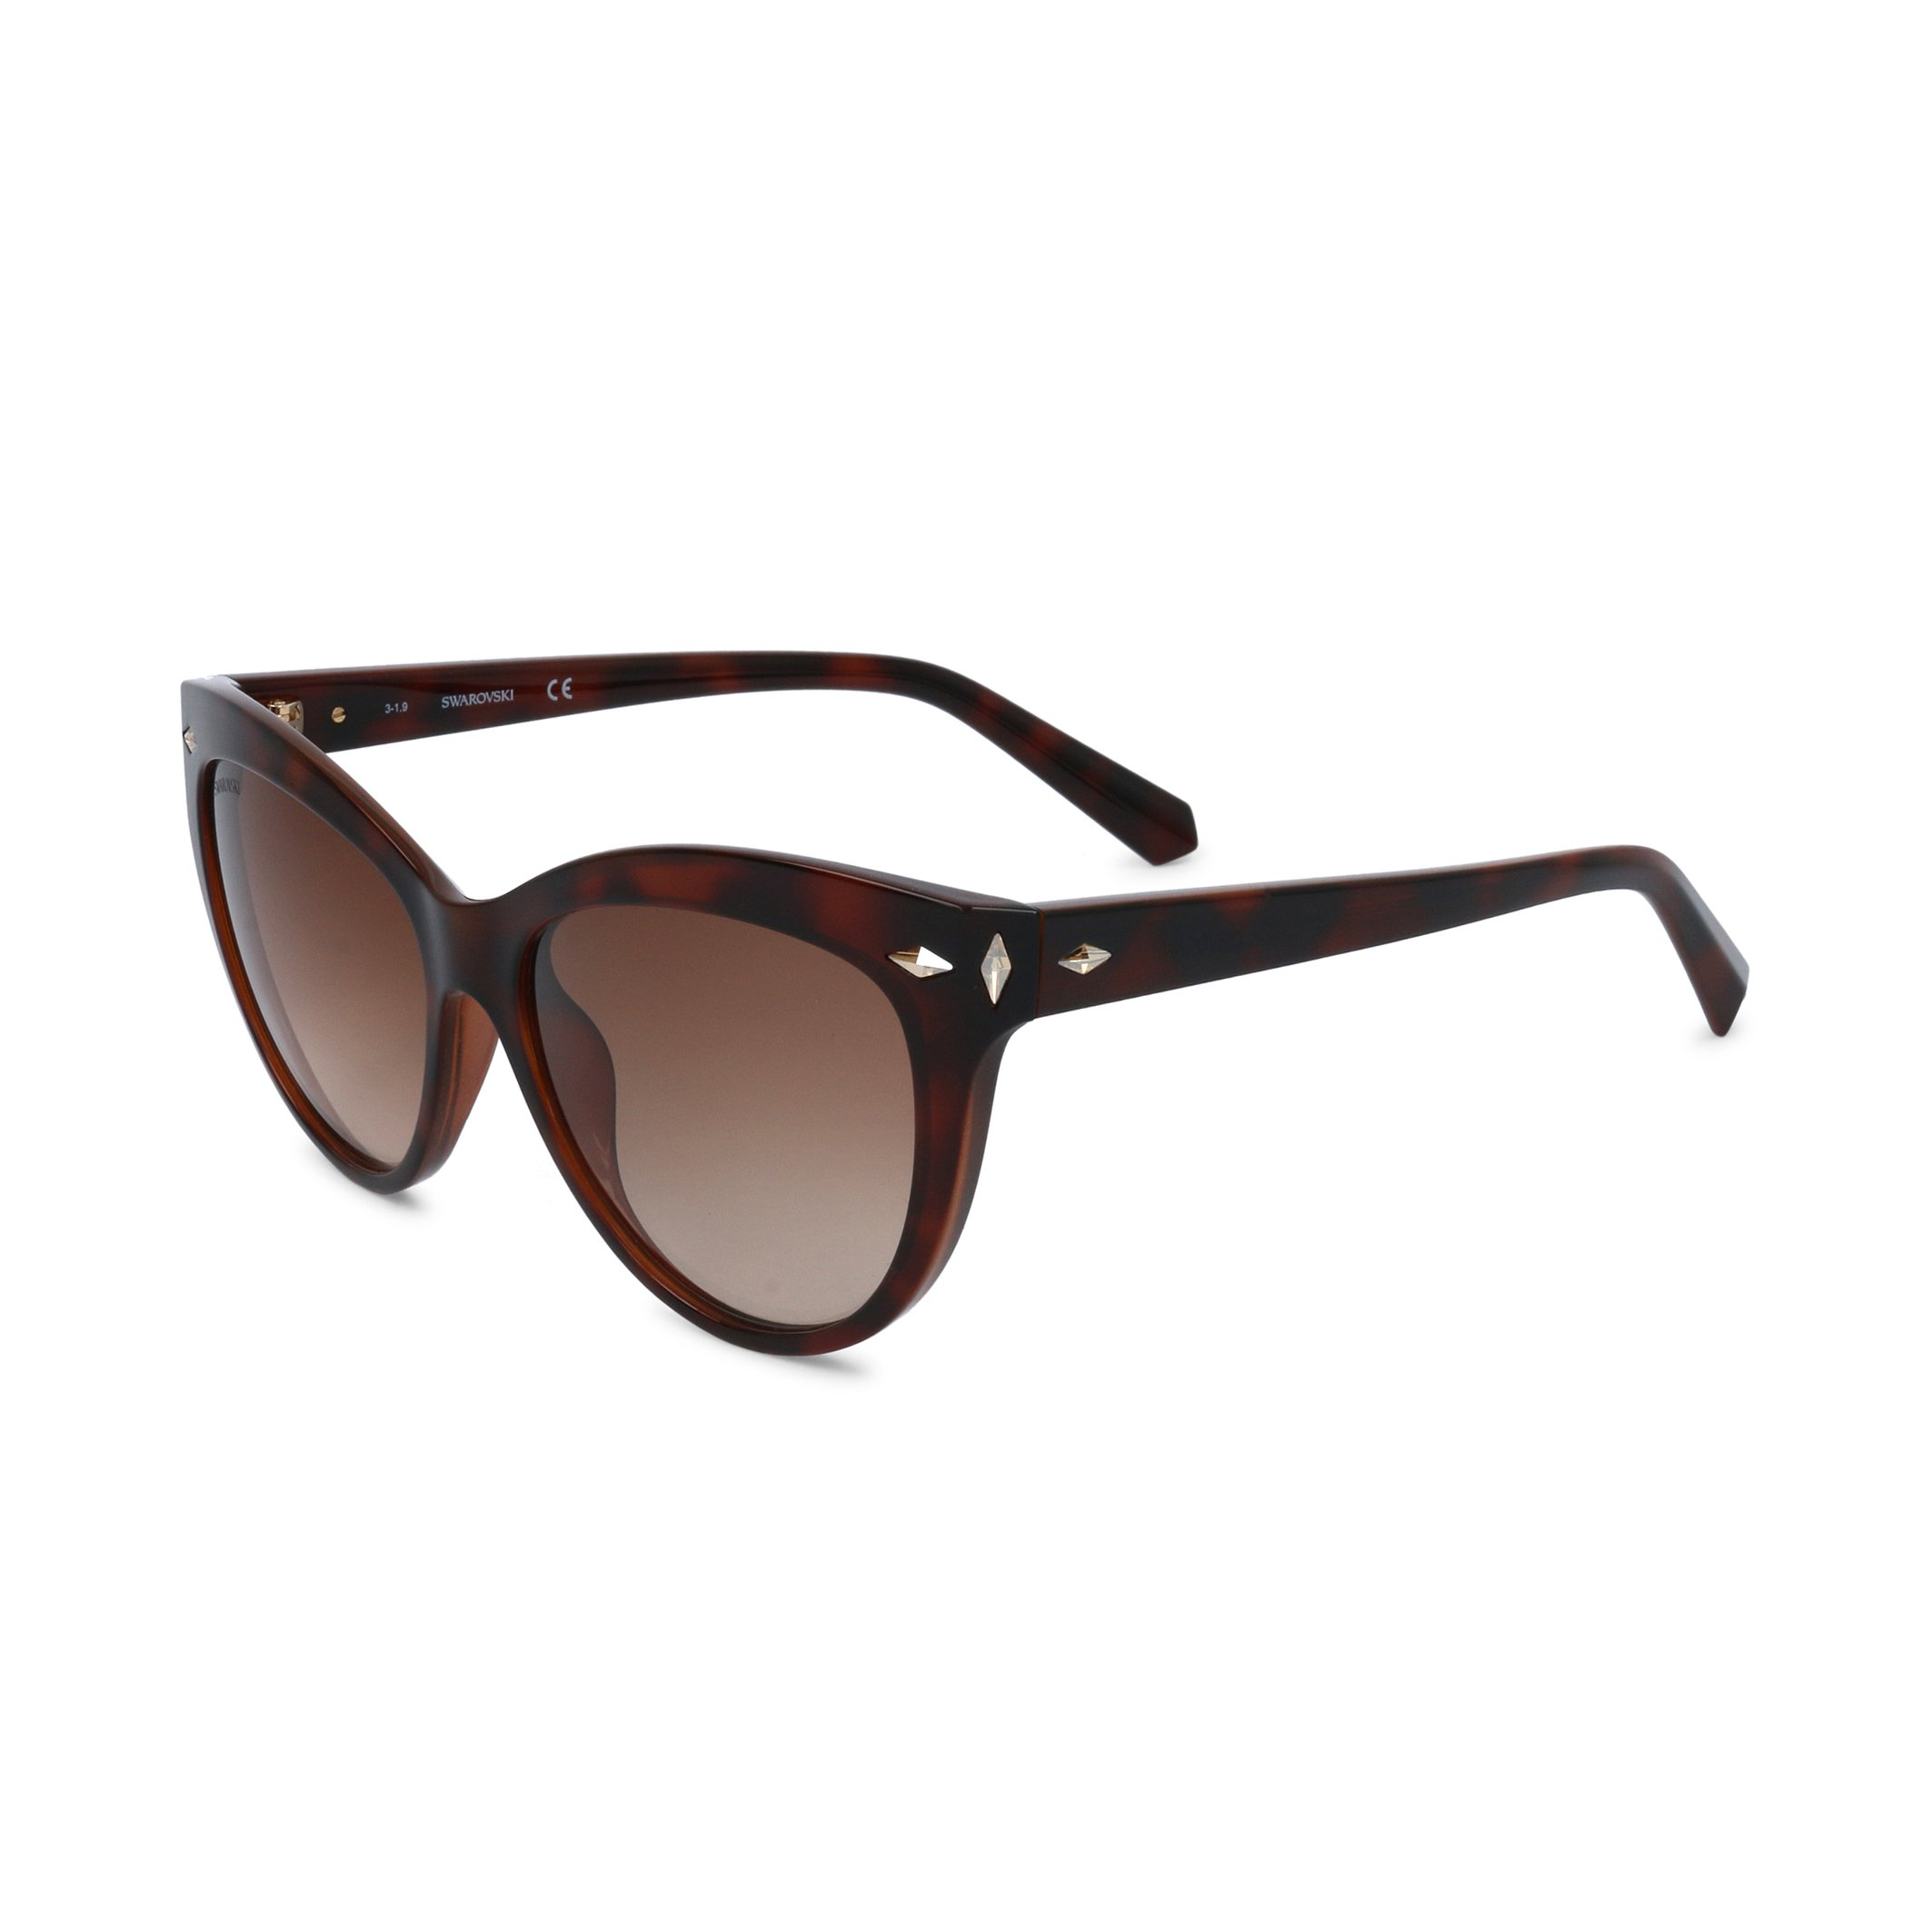 Swarovski Women's Sunglasses Black SK0176 - brown NOSIZE